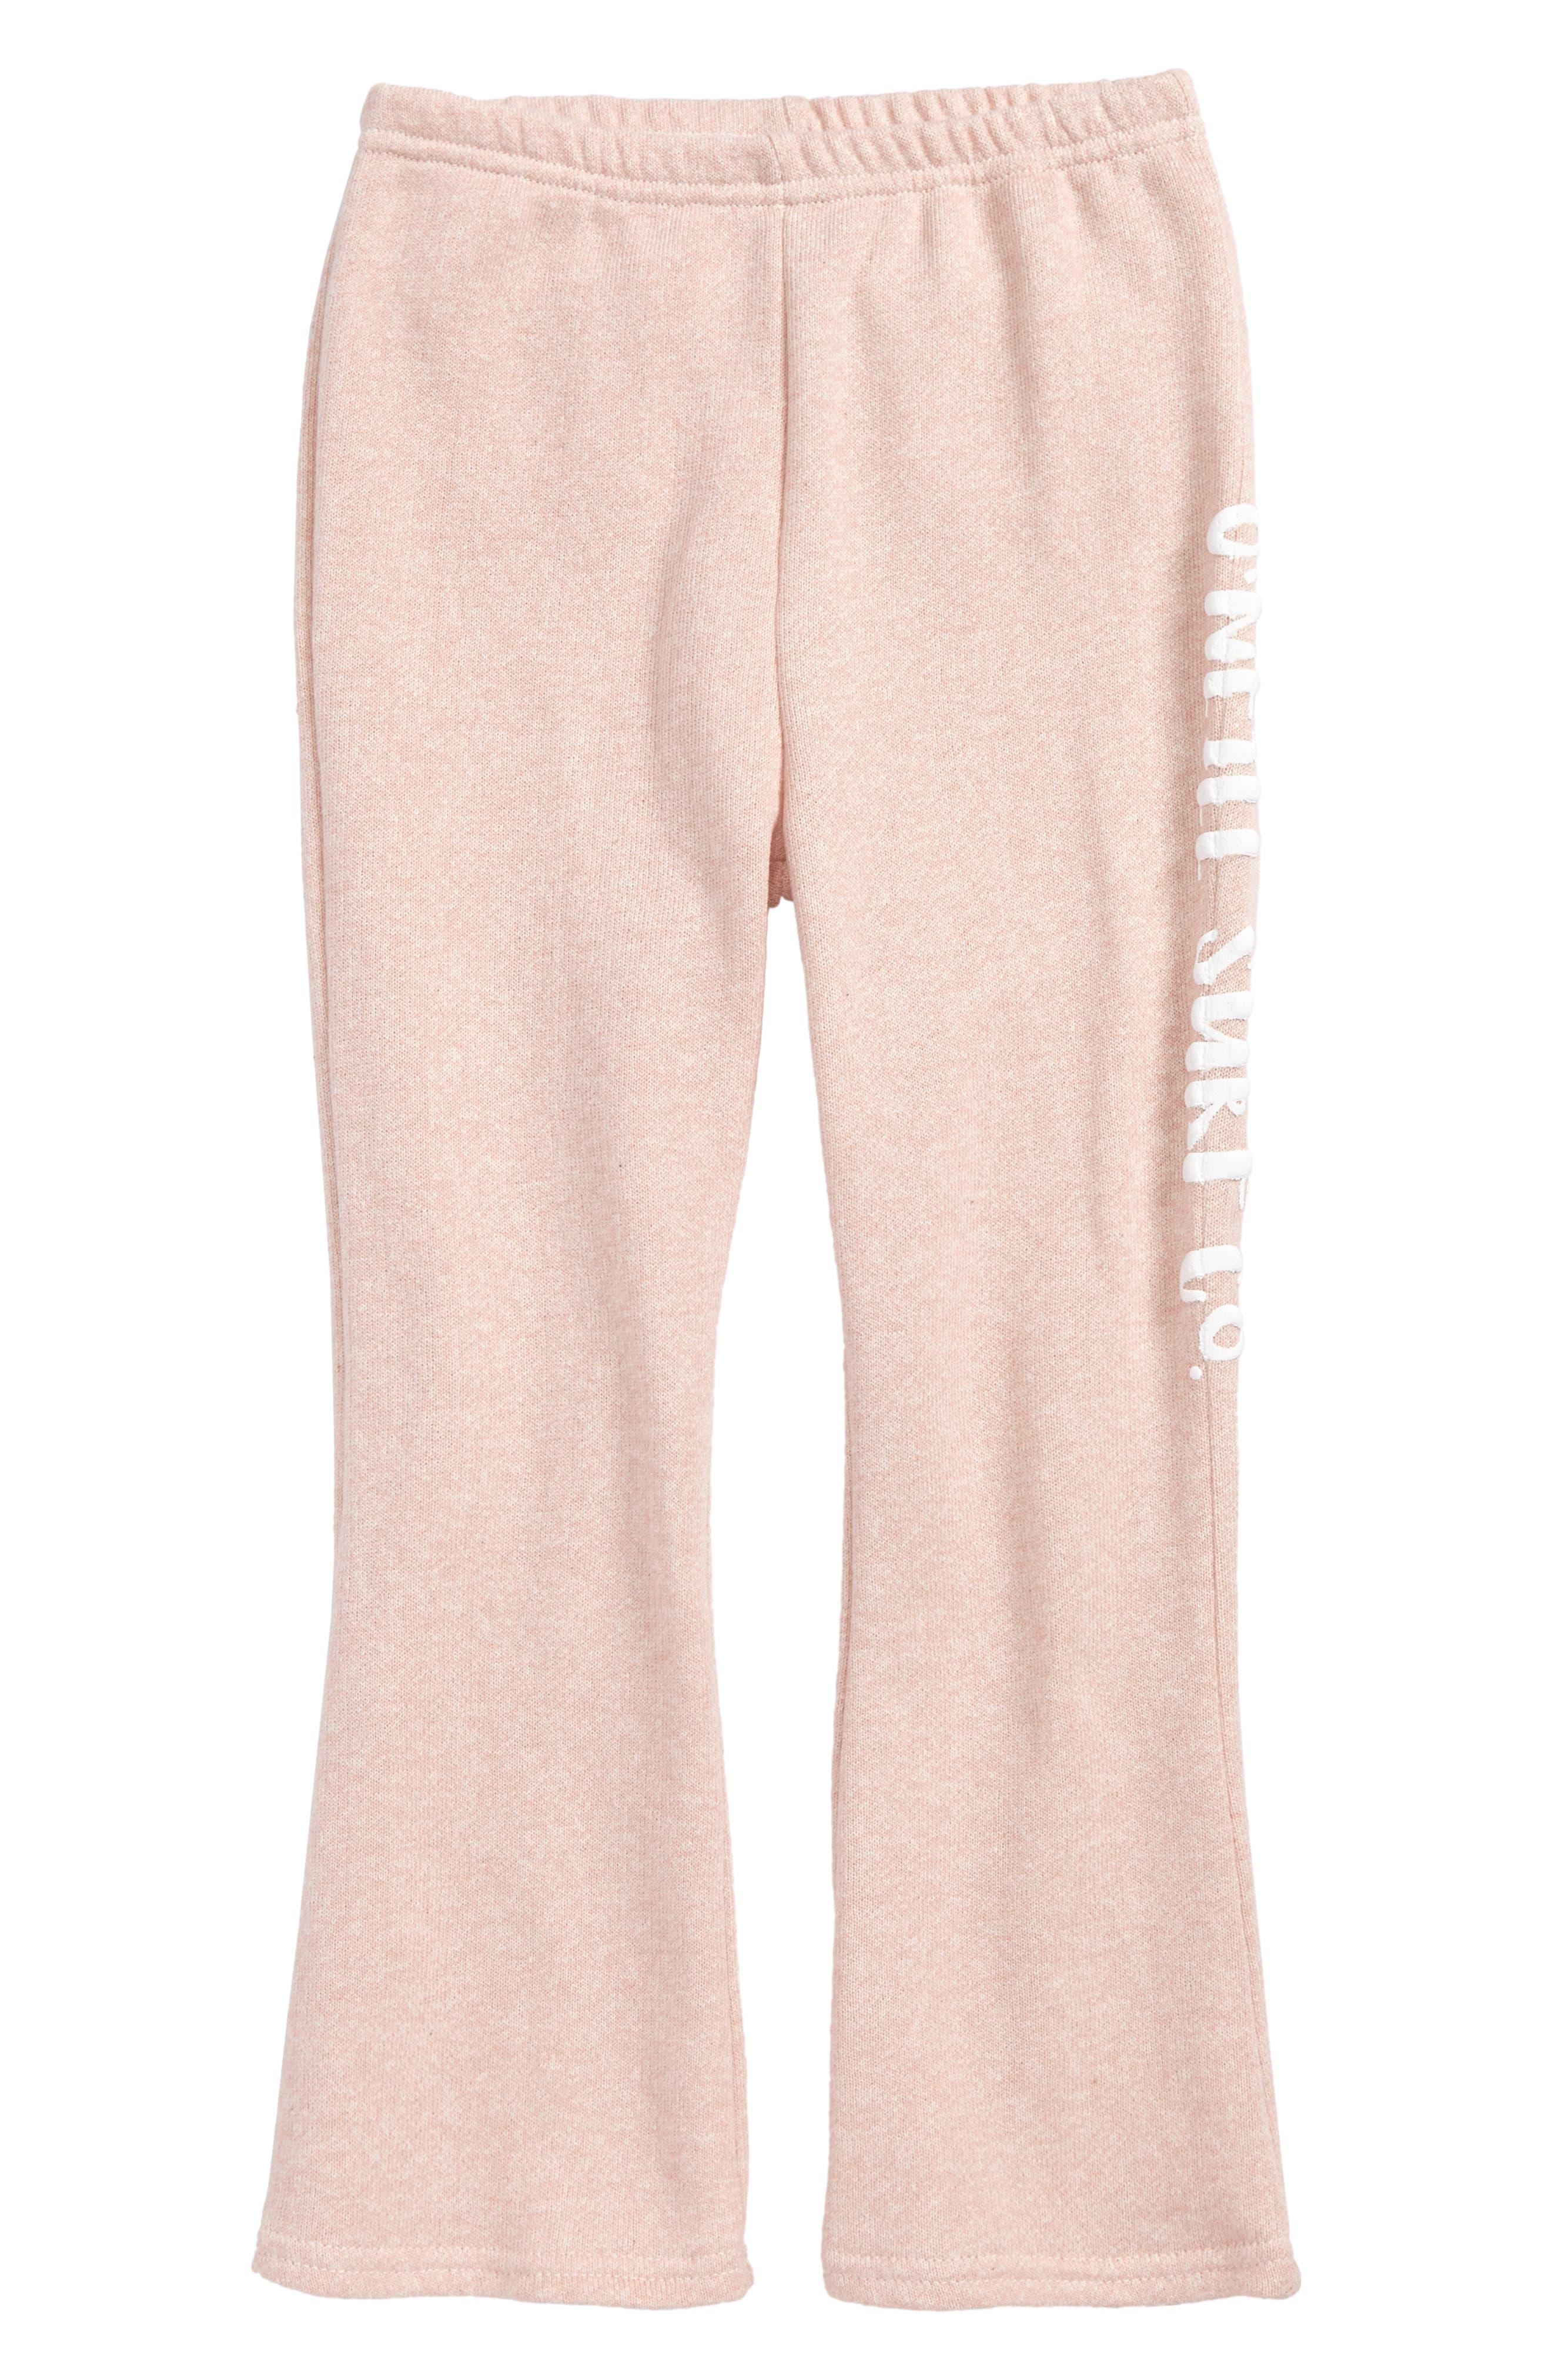 Beach Belle Fleece Pants,                         Main,                         color, 693